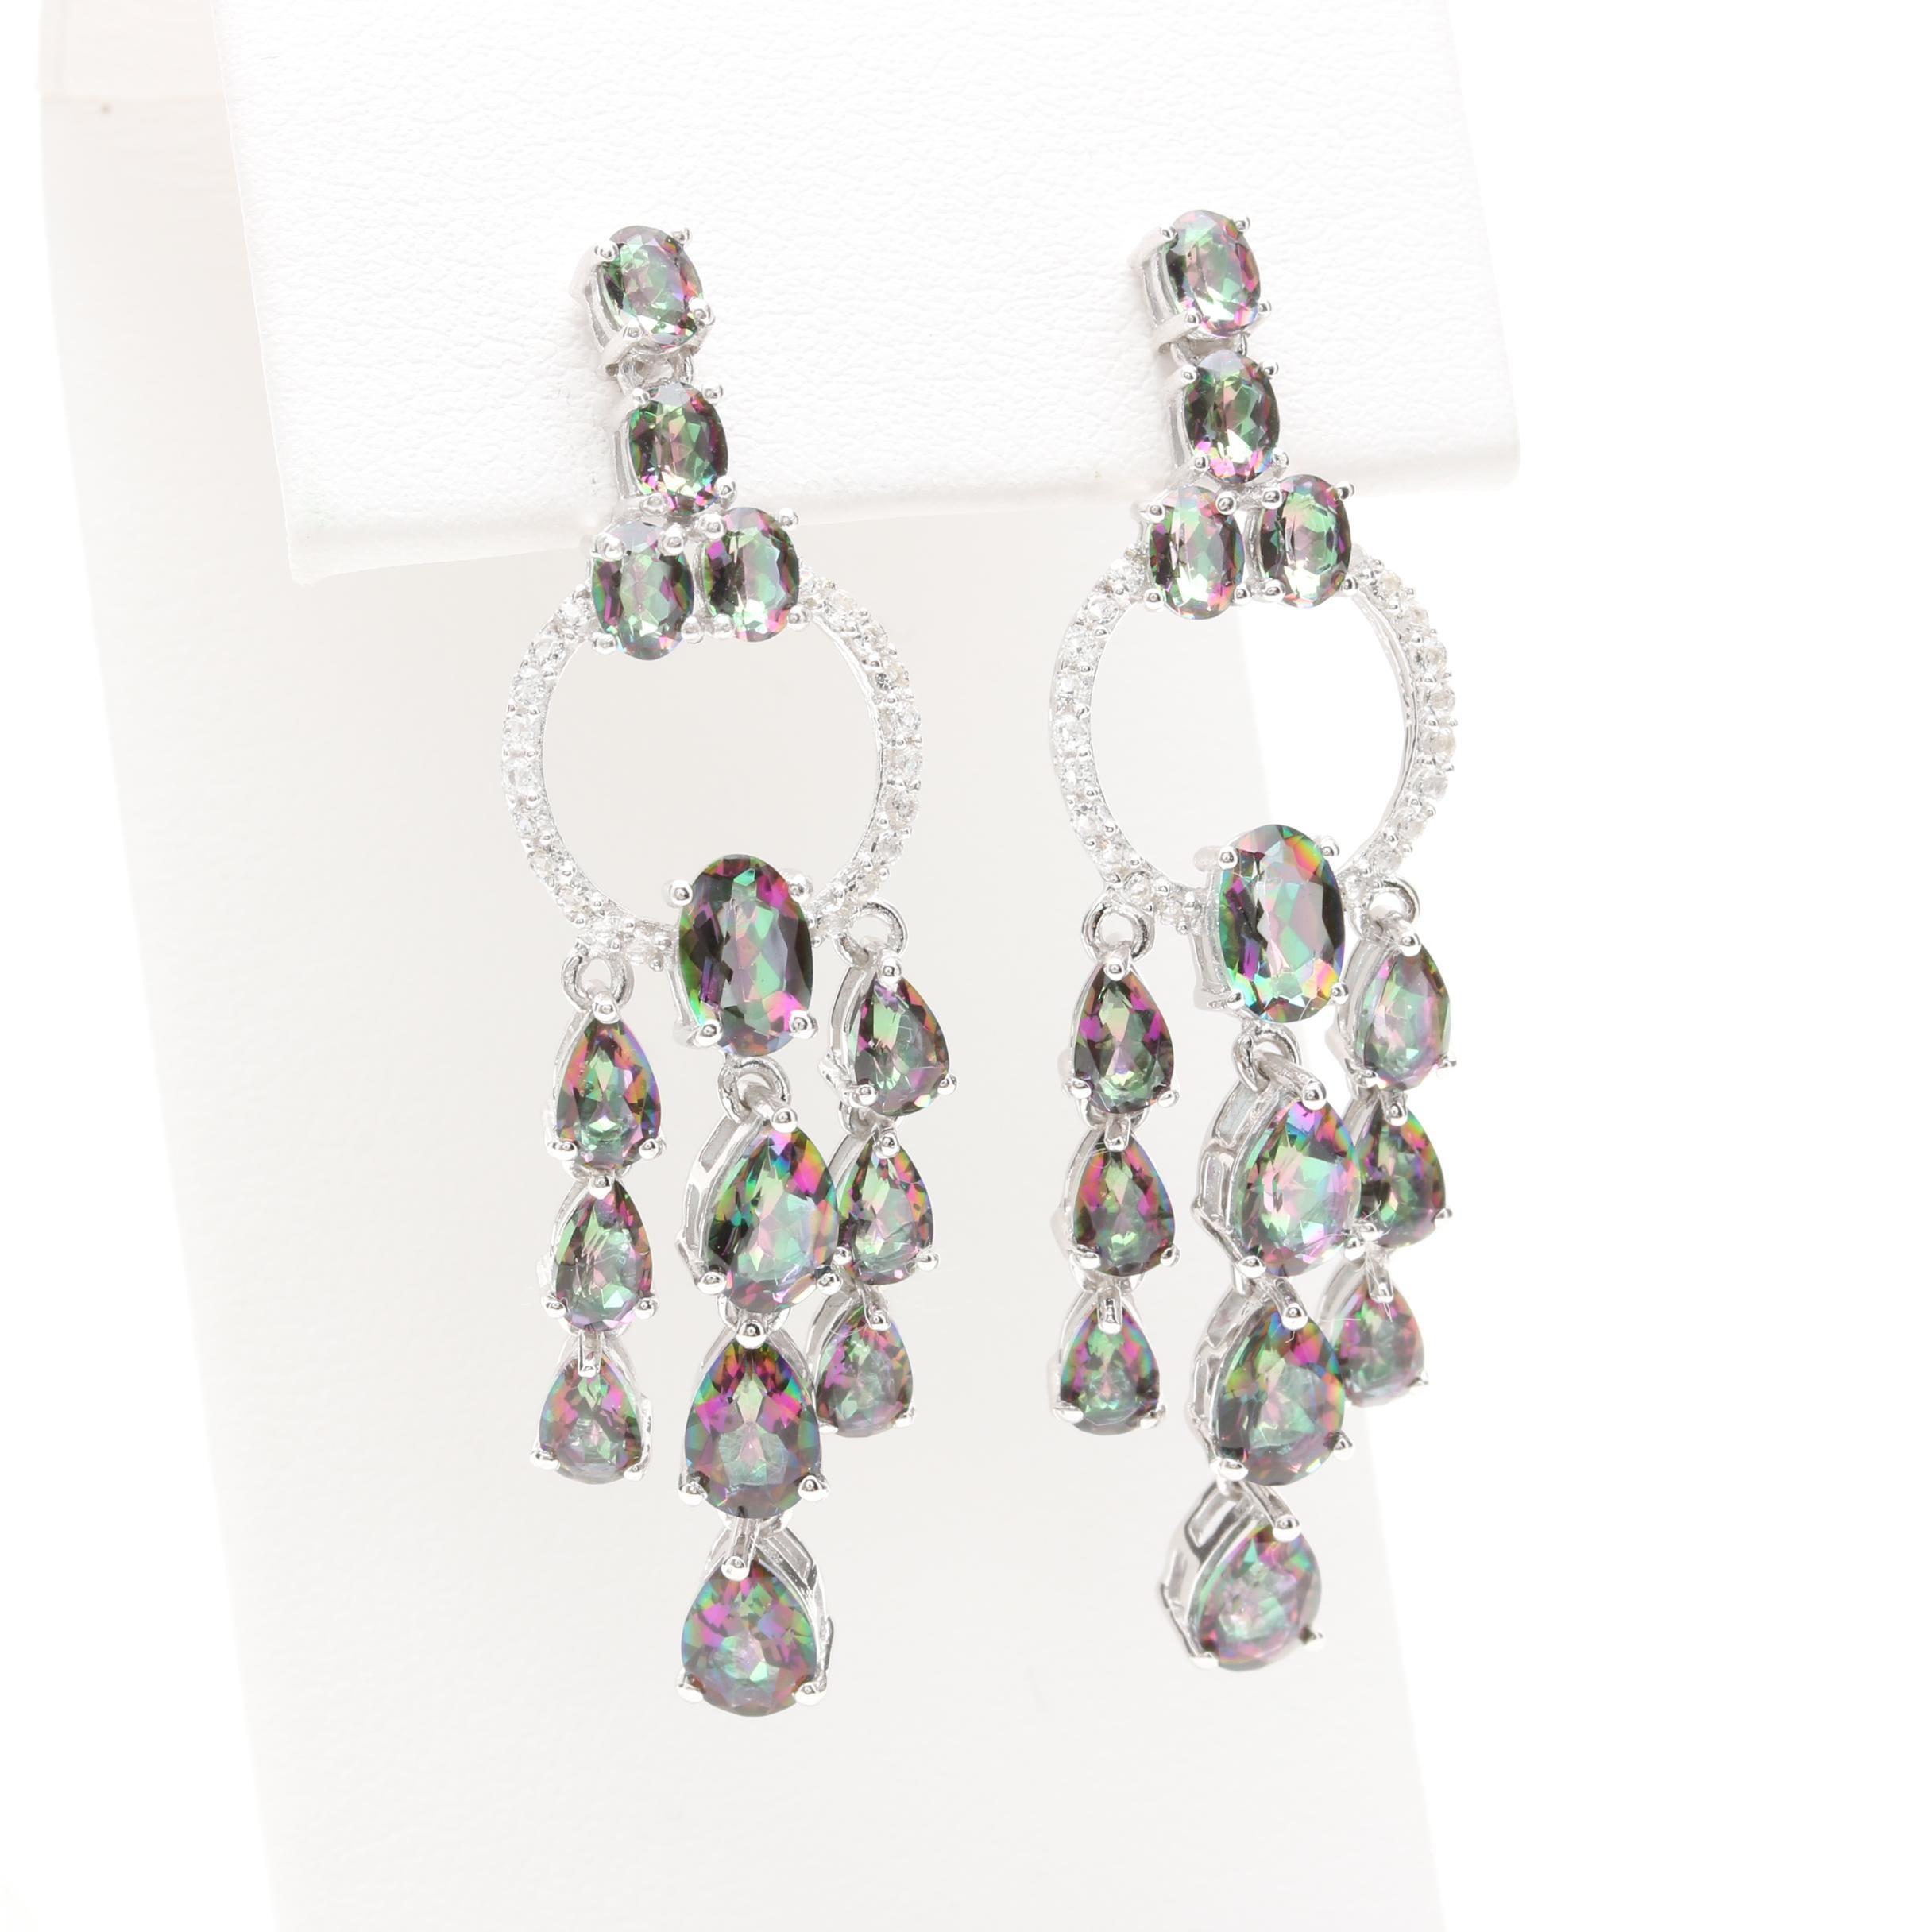 Sterling Silver Mystic Quartz and White Topaz Girandole Earrings